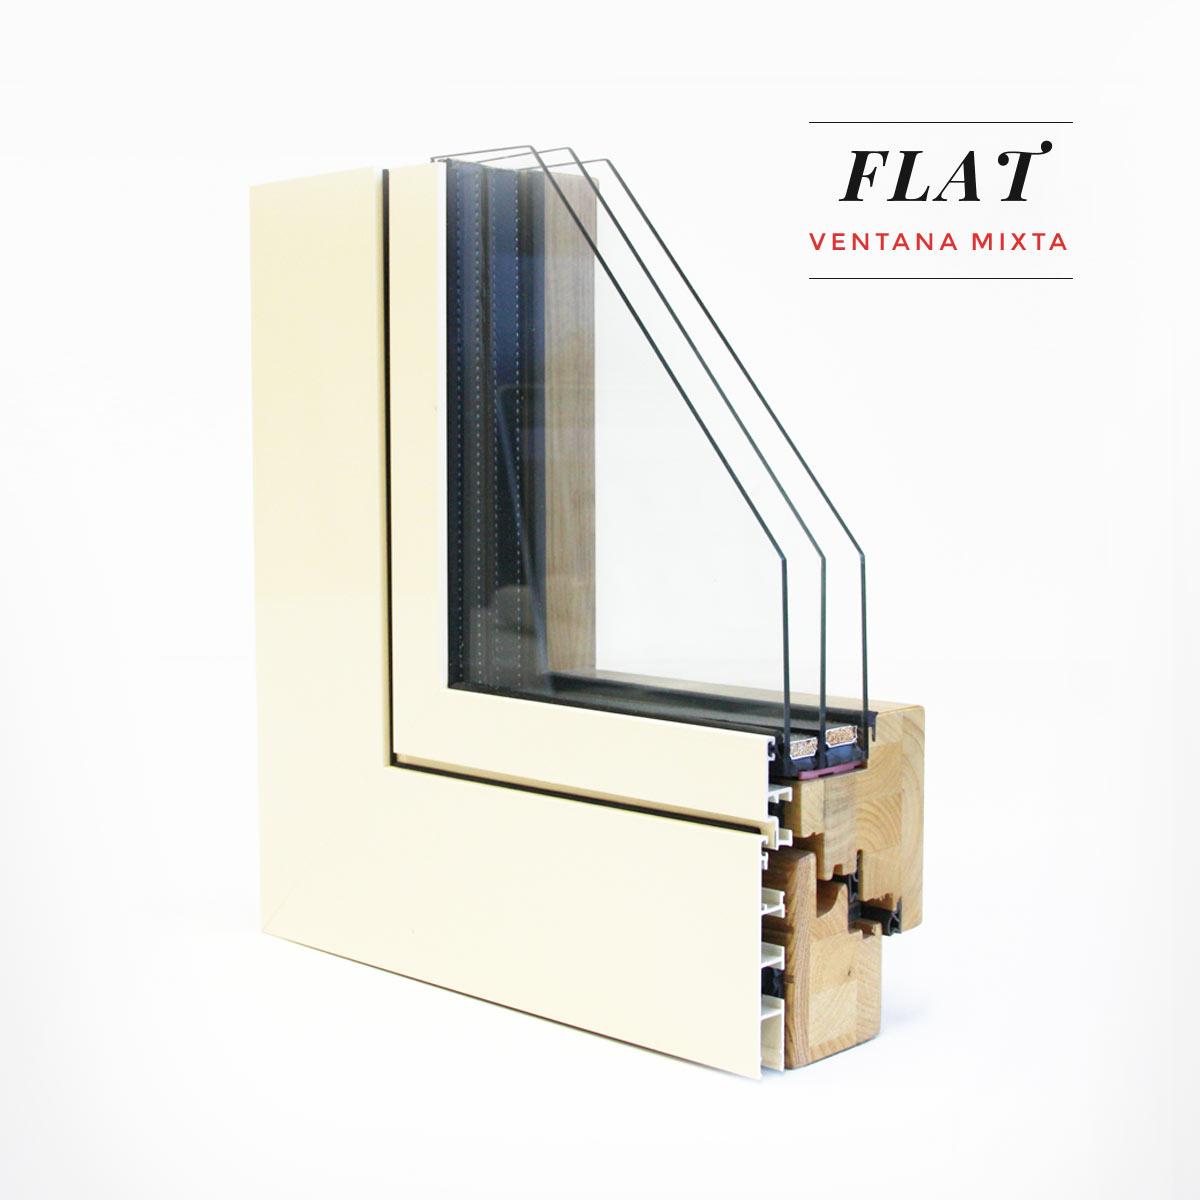 Carreté Finestres - ventana mixta Flat de madera de pino natural y aluminio con exterior Blanco